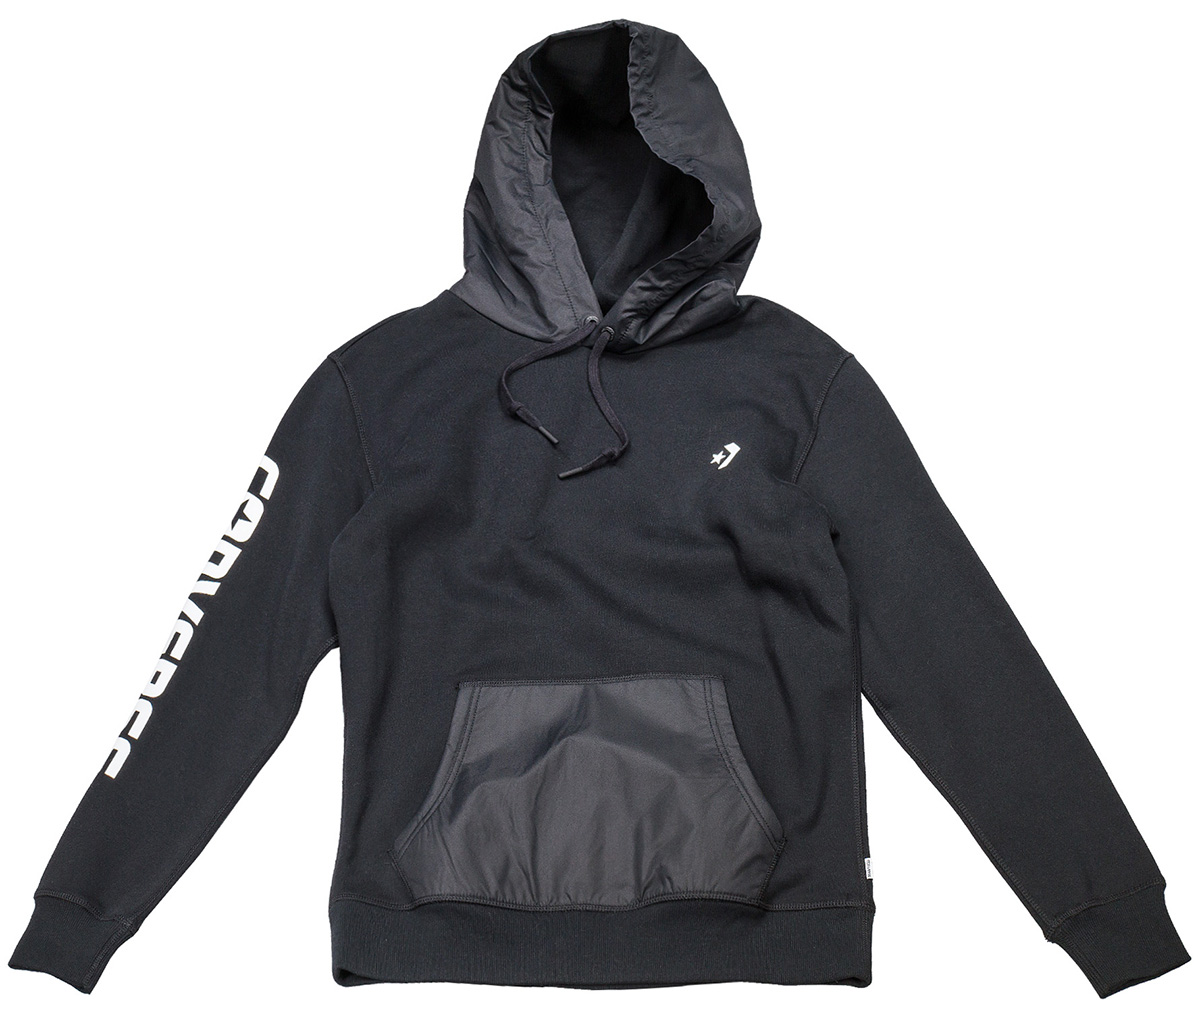 Толстовка мужская Converse Converse Mixed Media Pullover Hoodie, цвет: черный, серый. 10004640001. Размер XL (52) толстовка женская converse core full zip hoodie цвет синий 10002089414 размер xl 50